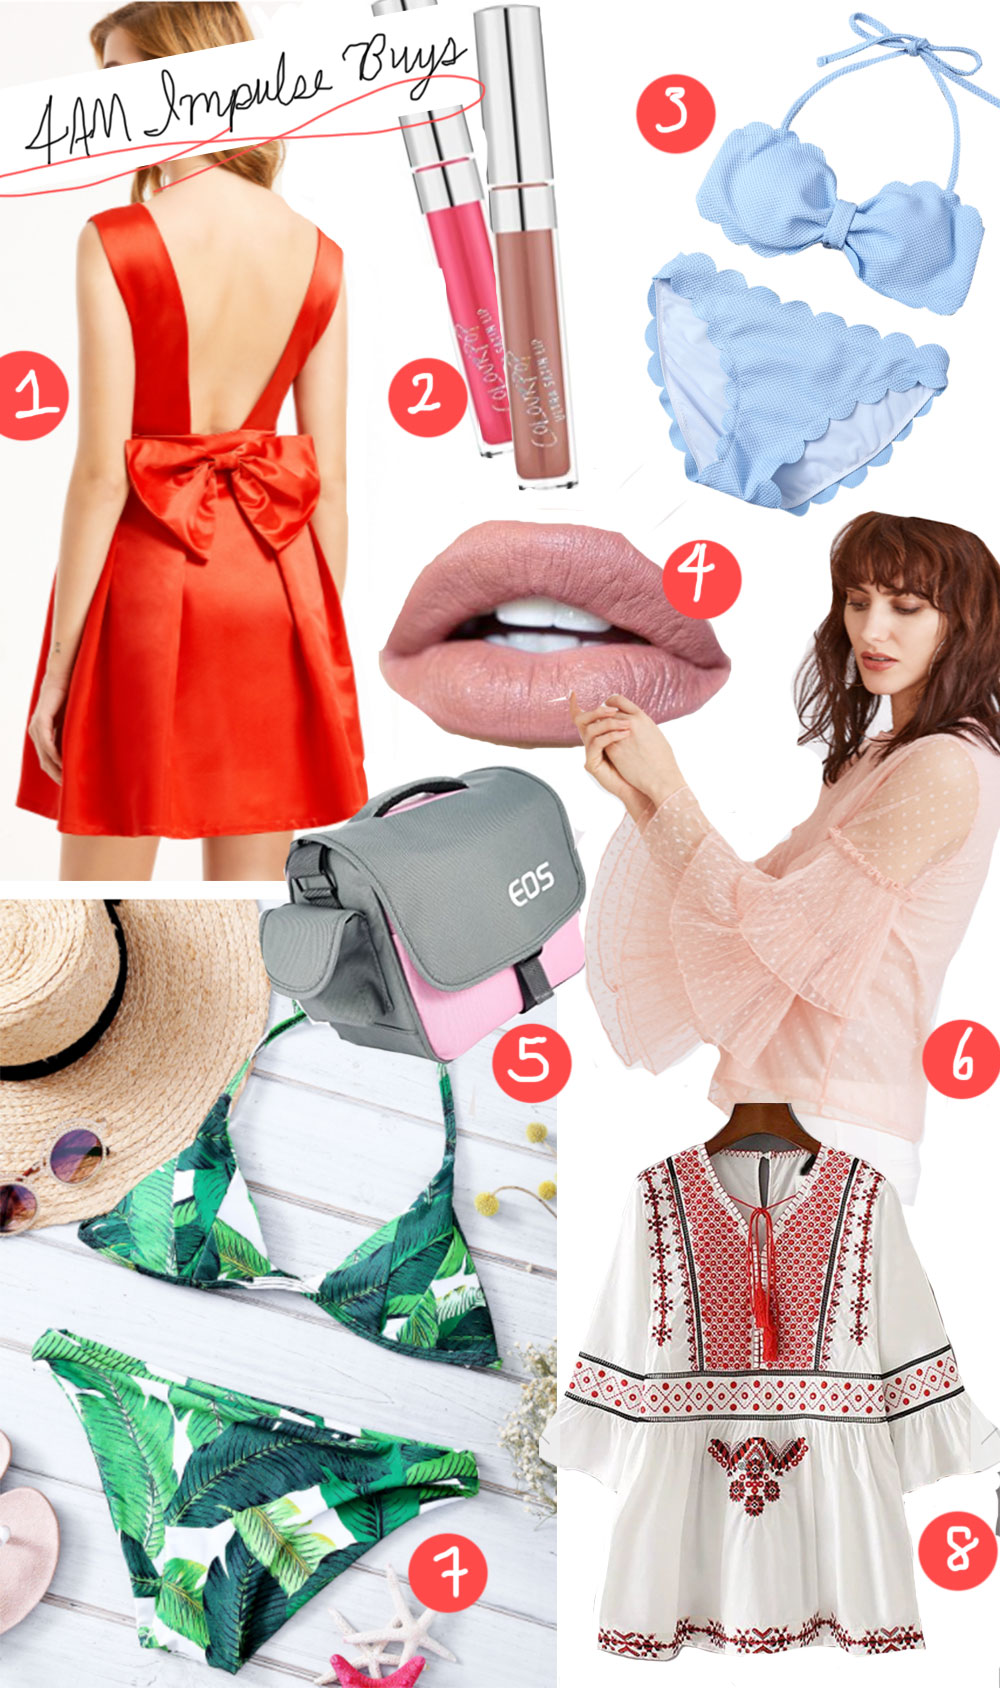 Red bow back dress and palm print halter bikini